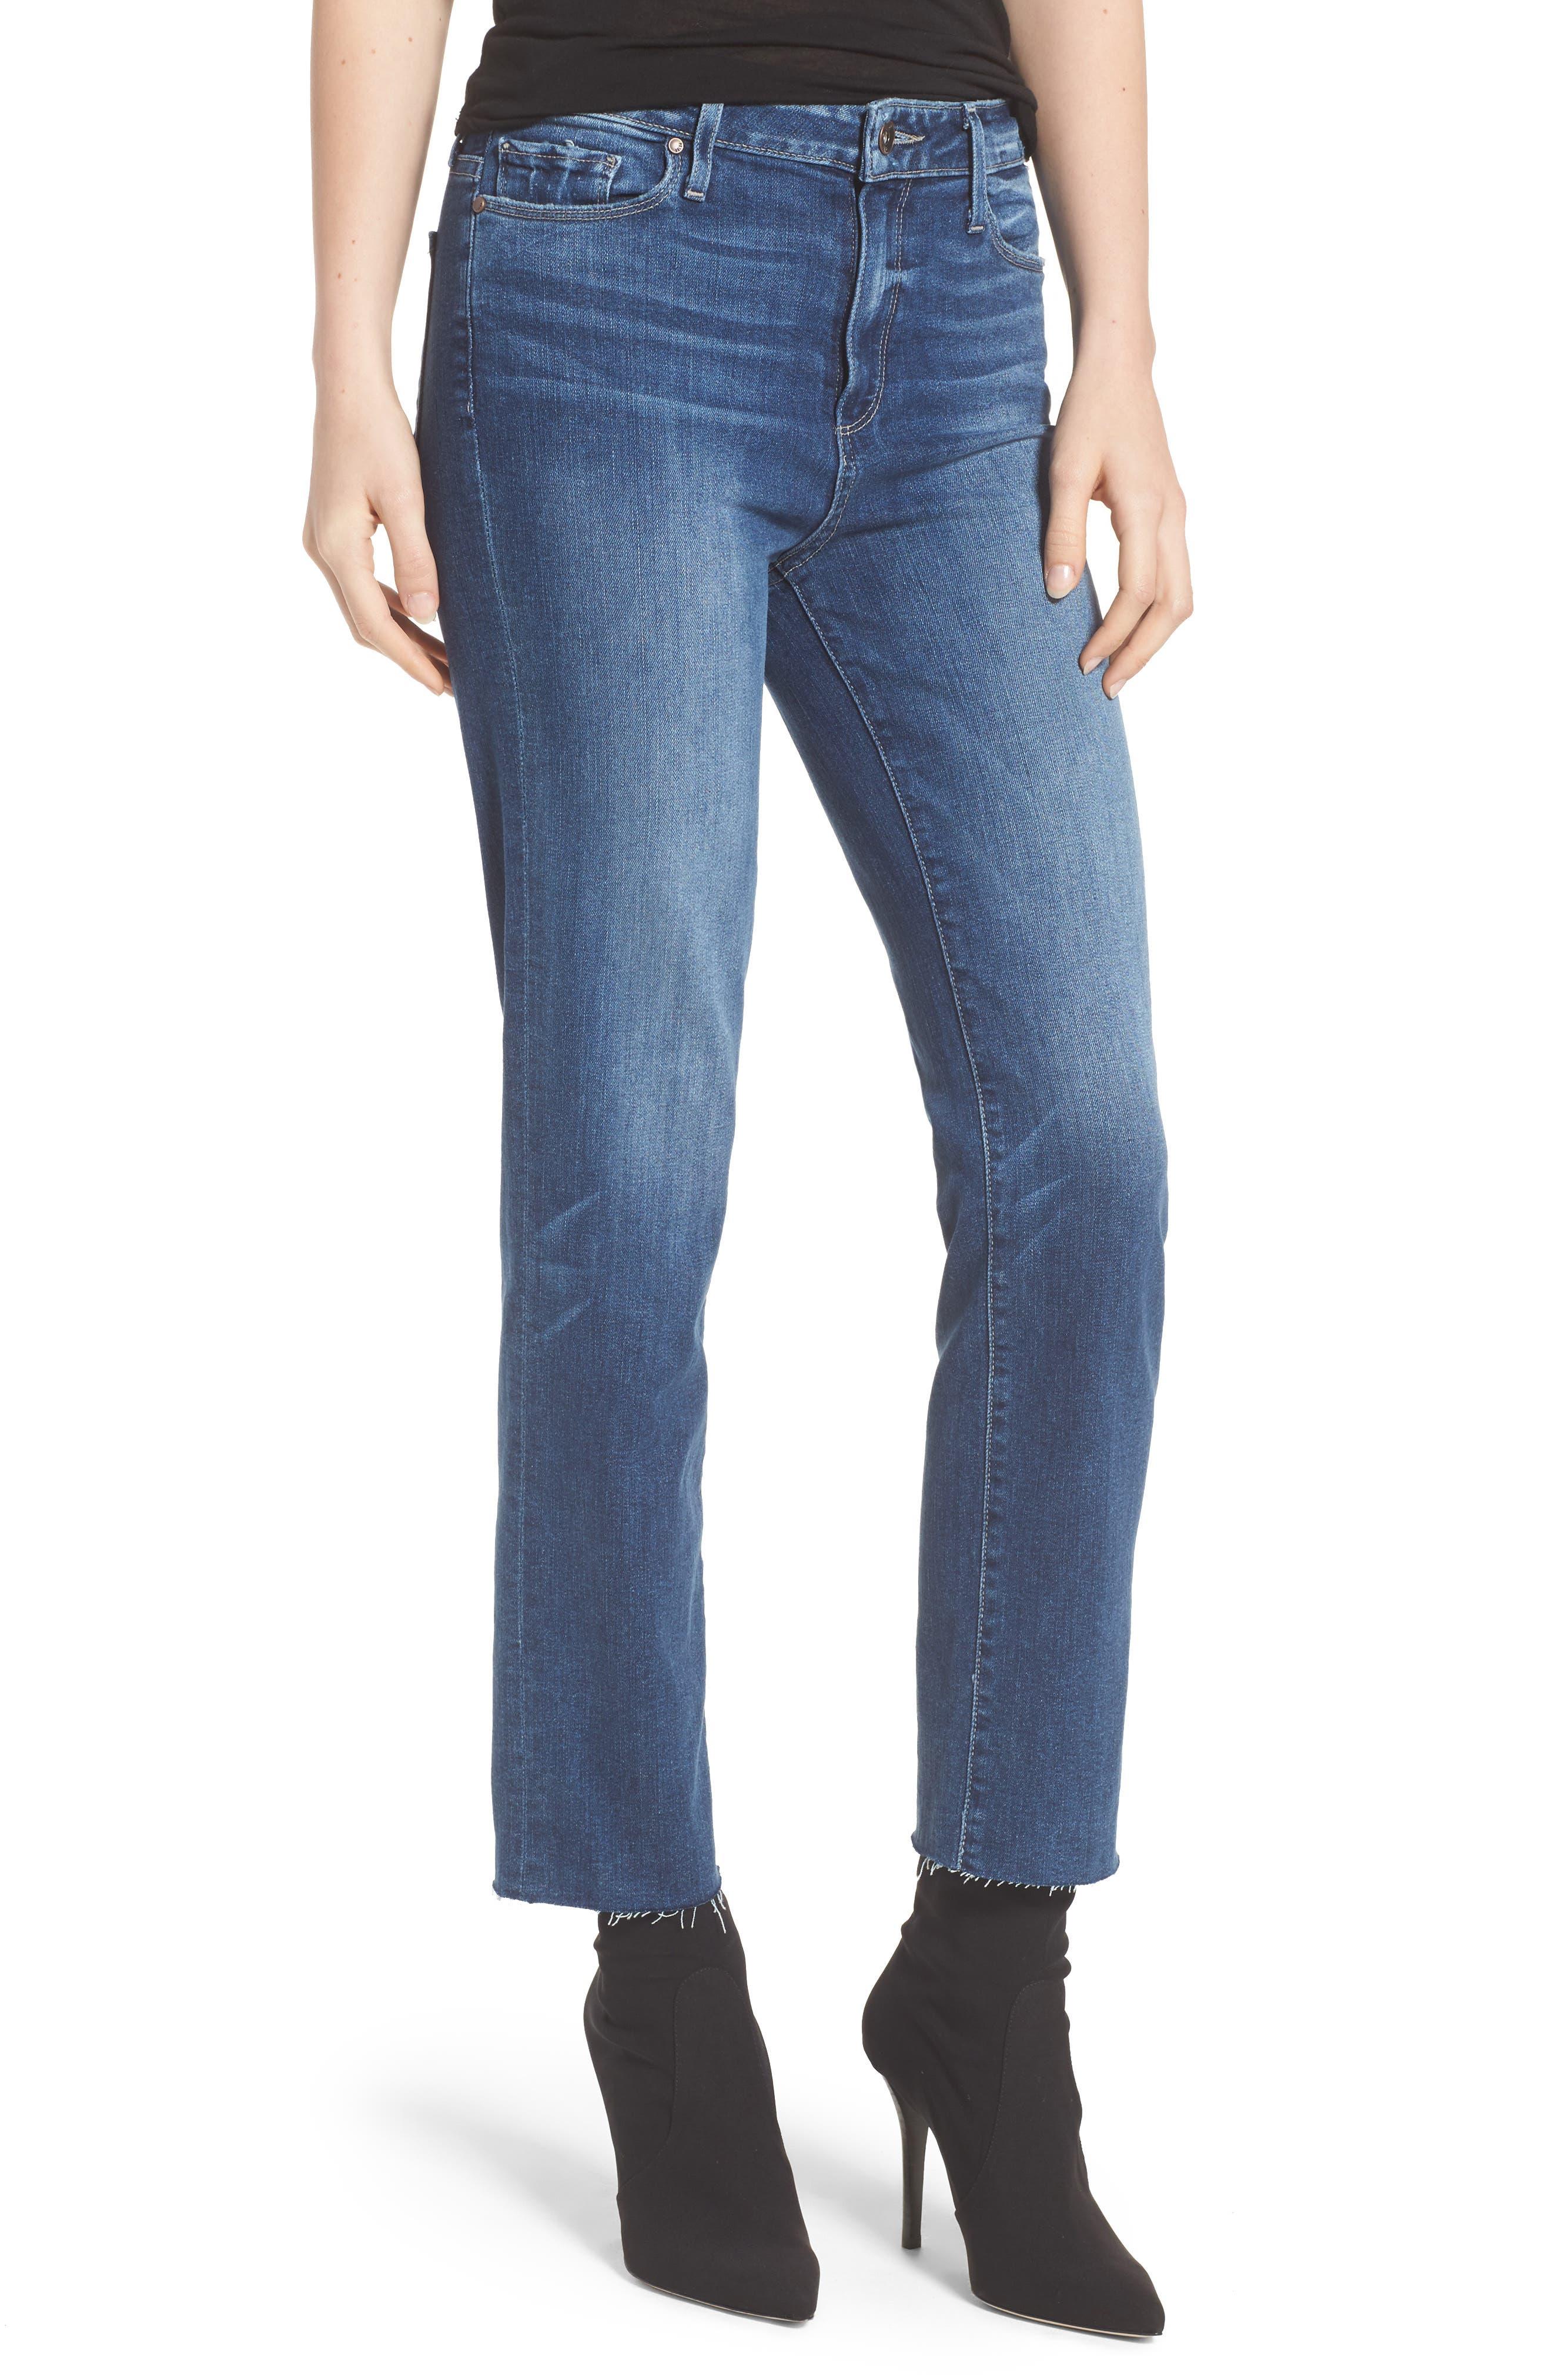 Transcend - Hoxton Ankle Straight Leg Jeans,                             Main thumbnail 1, color,                             400